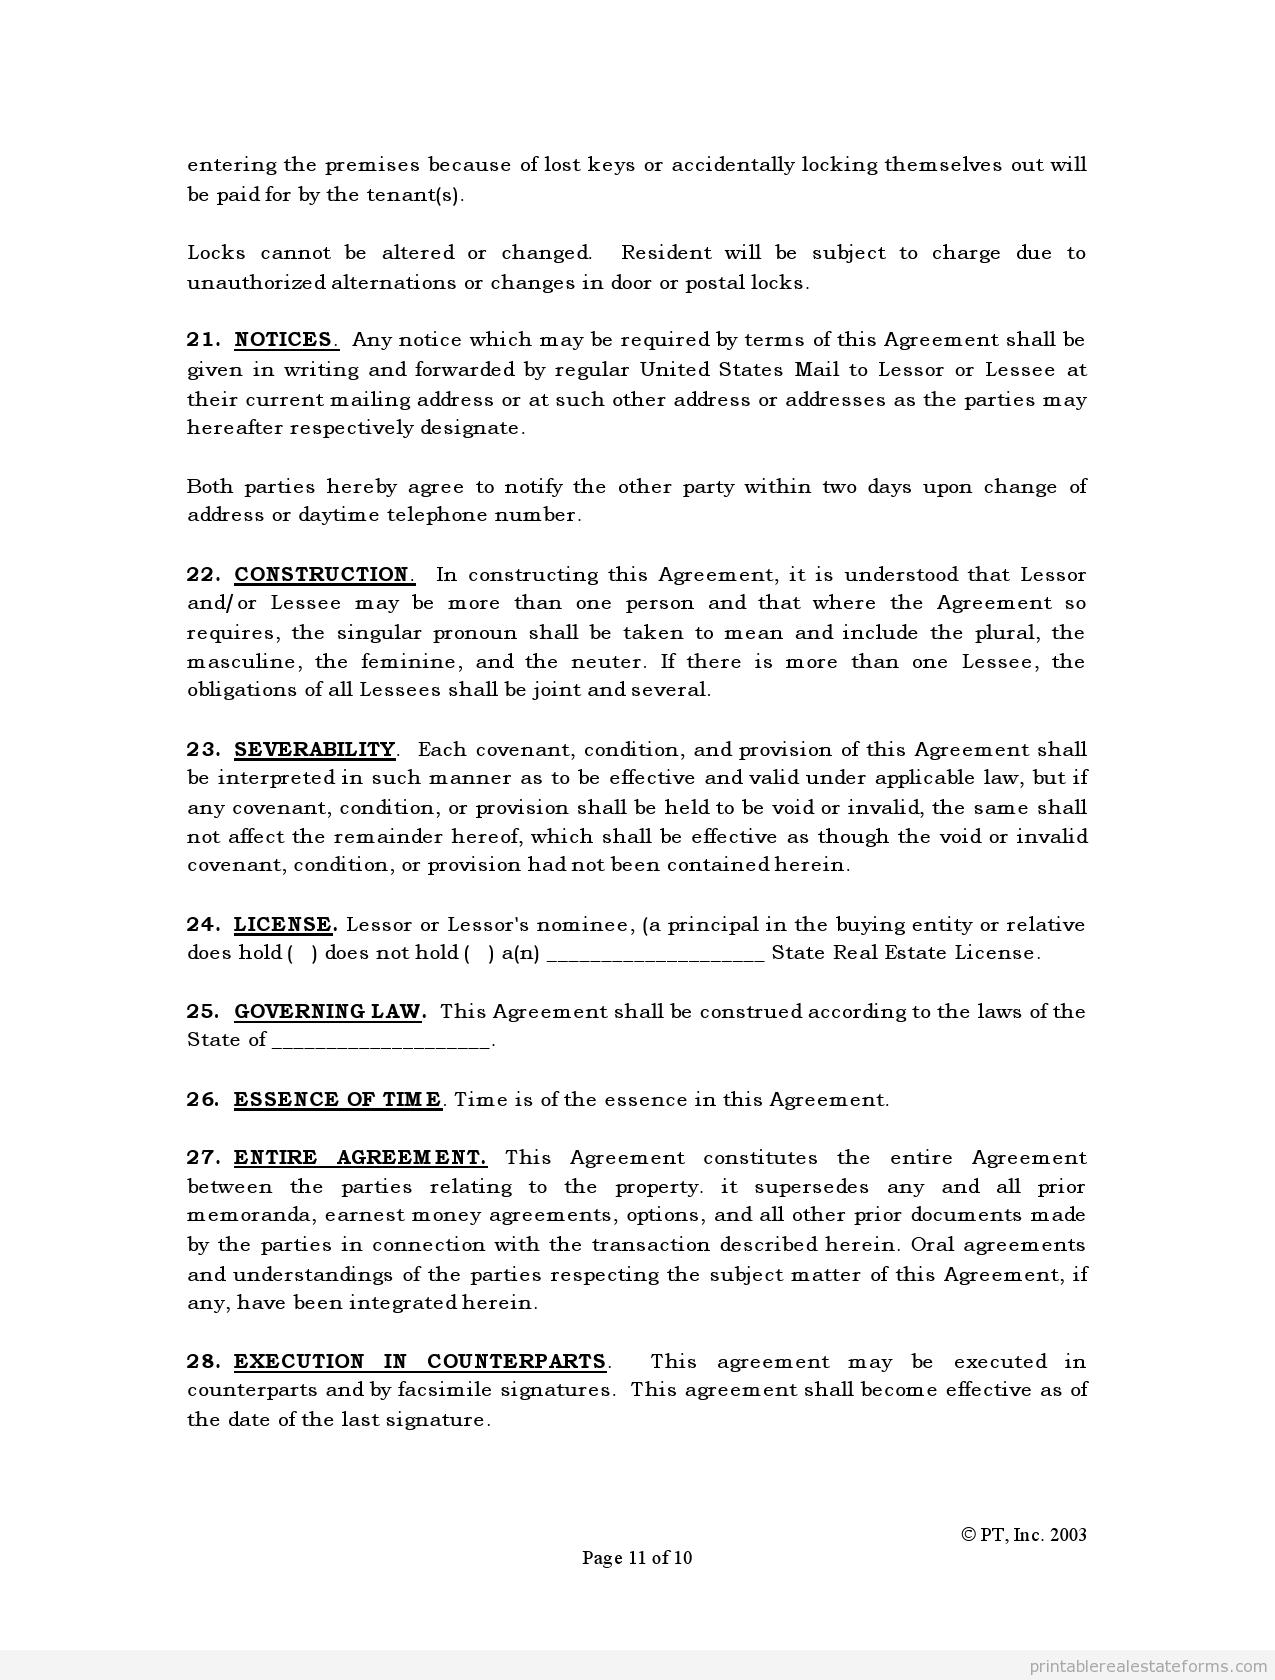 Free Printable Standard Lease Agreement Form Printable Real Estate